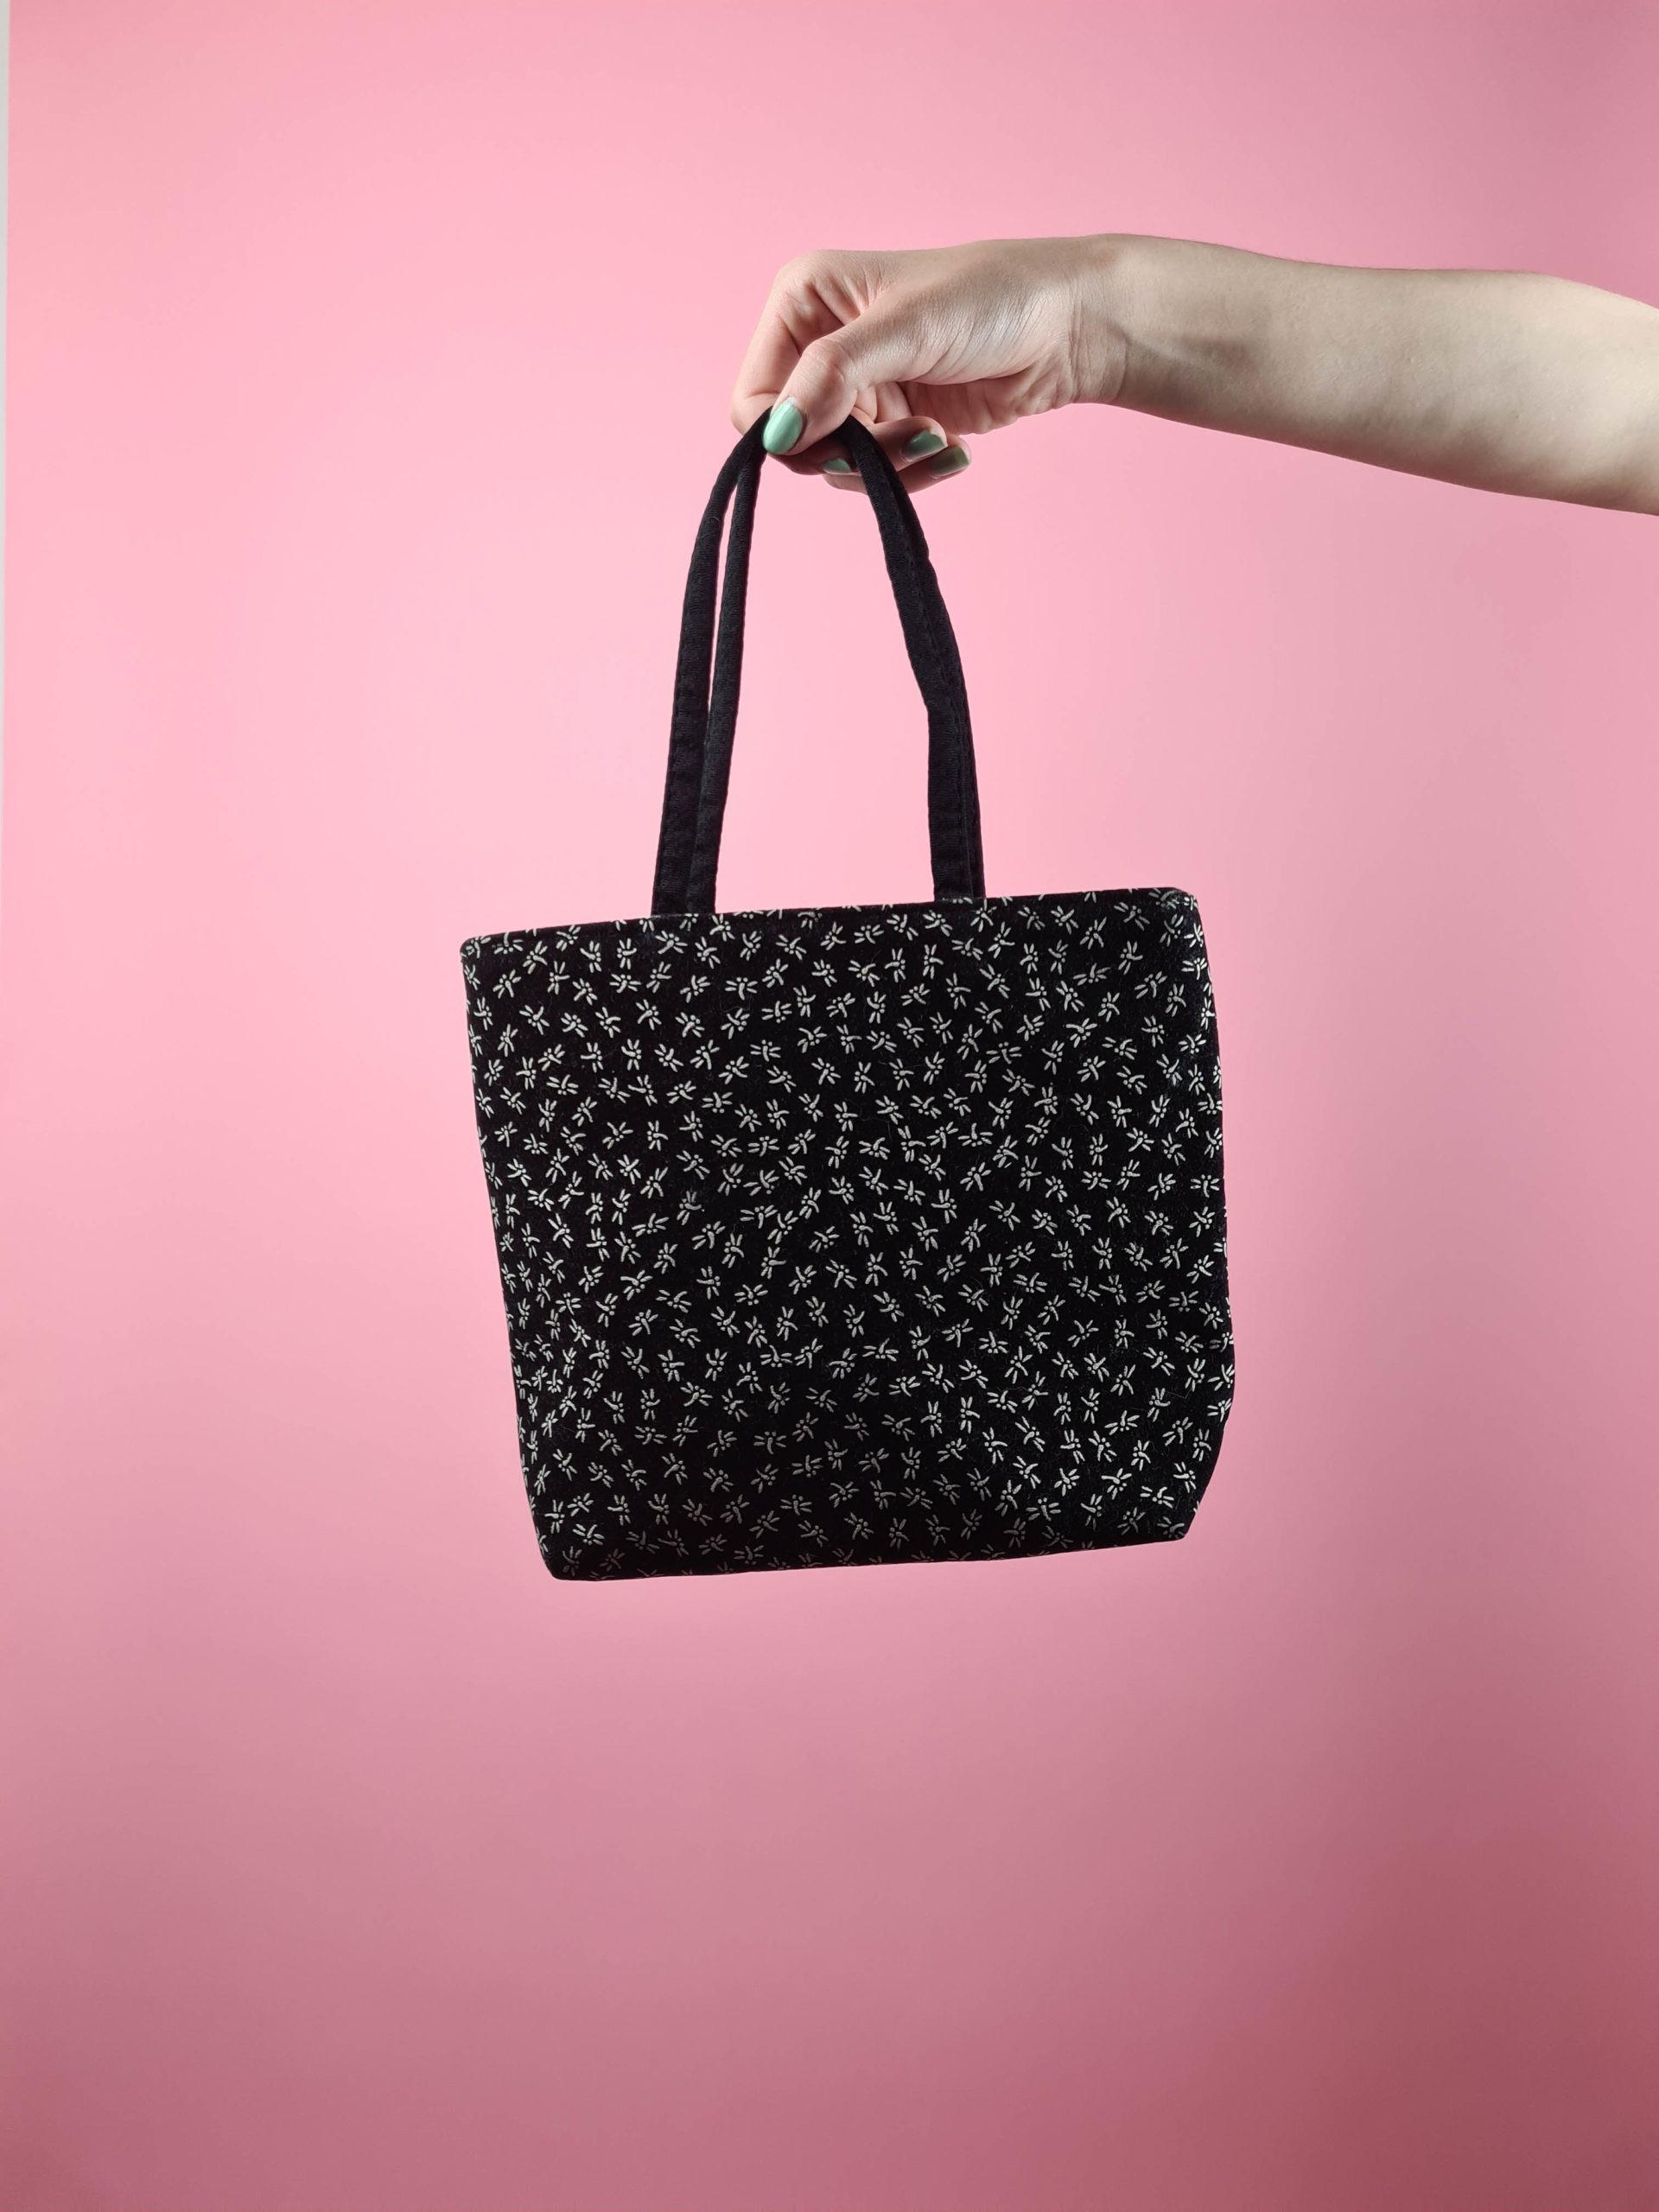 petit sac noir motif fleuri blanc (1)